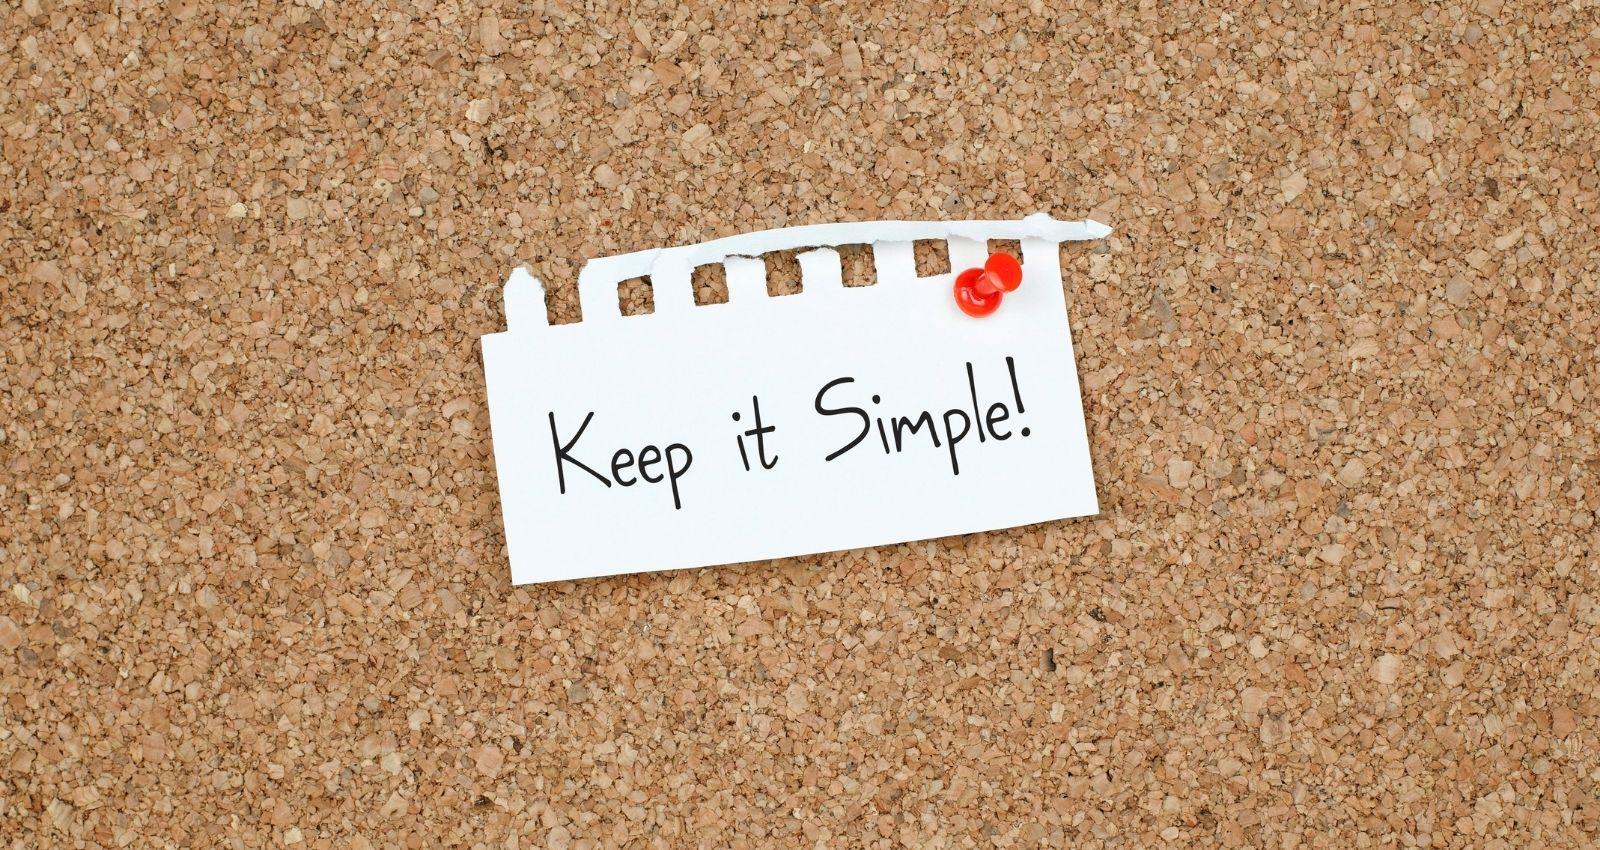 For Simplicity blog